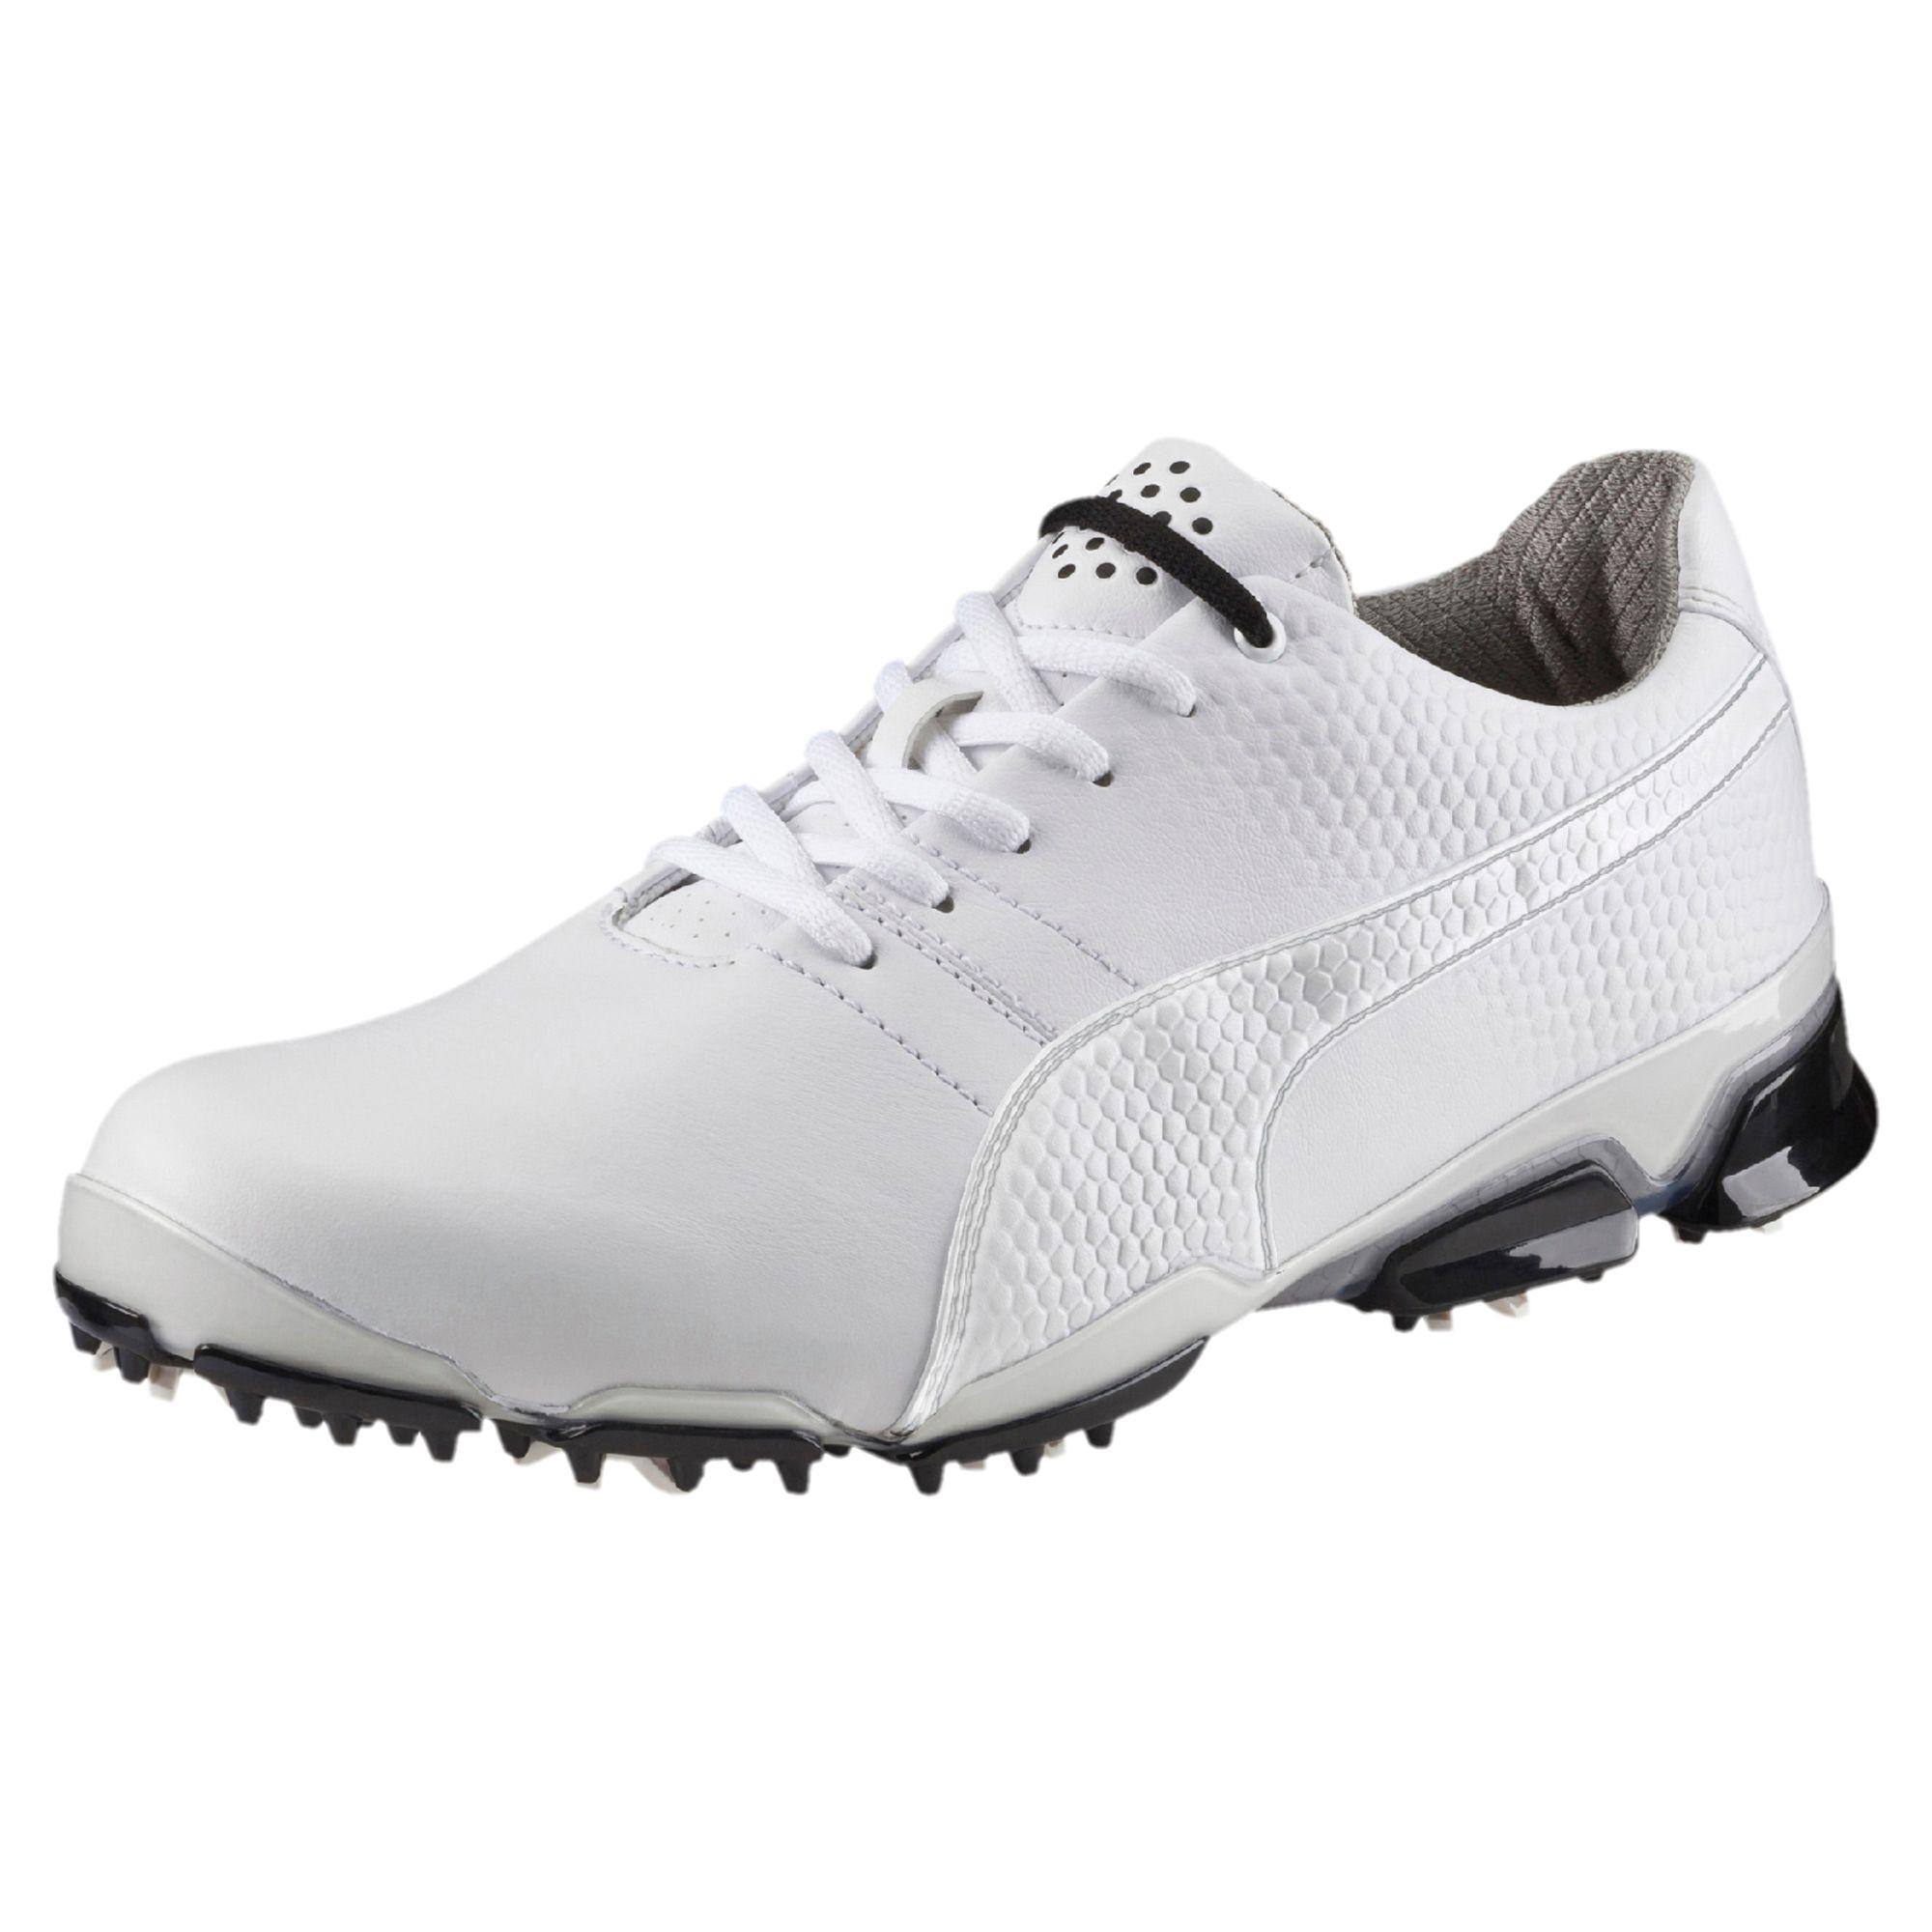 ТИТАН тур IGNITE обуви для гольфа